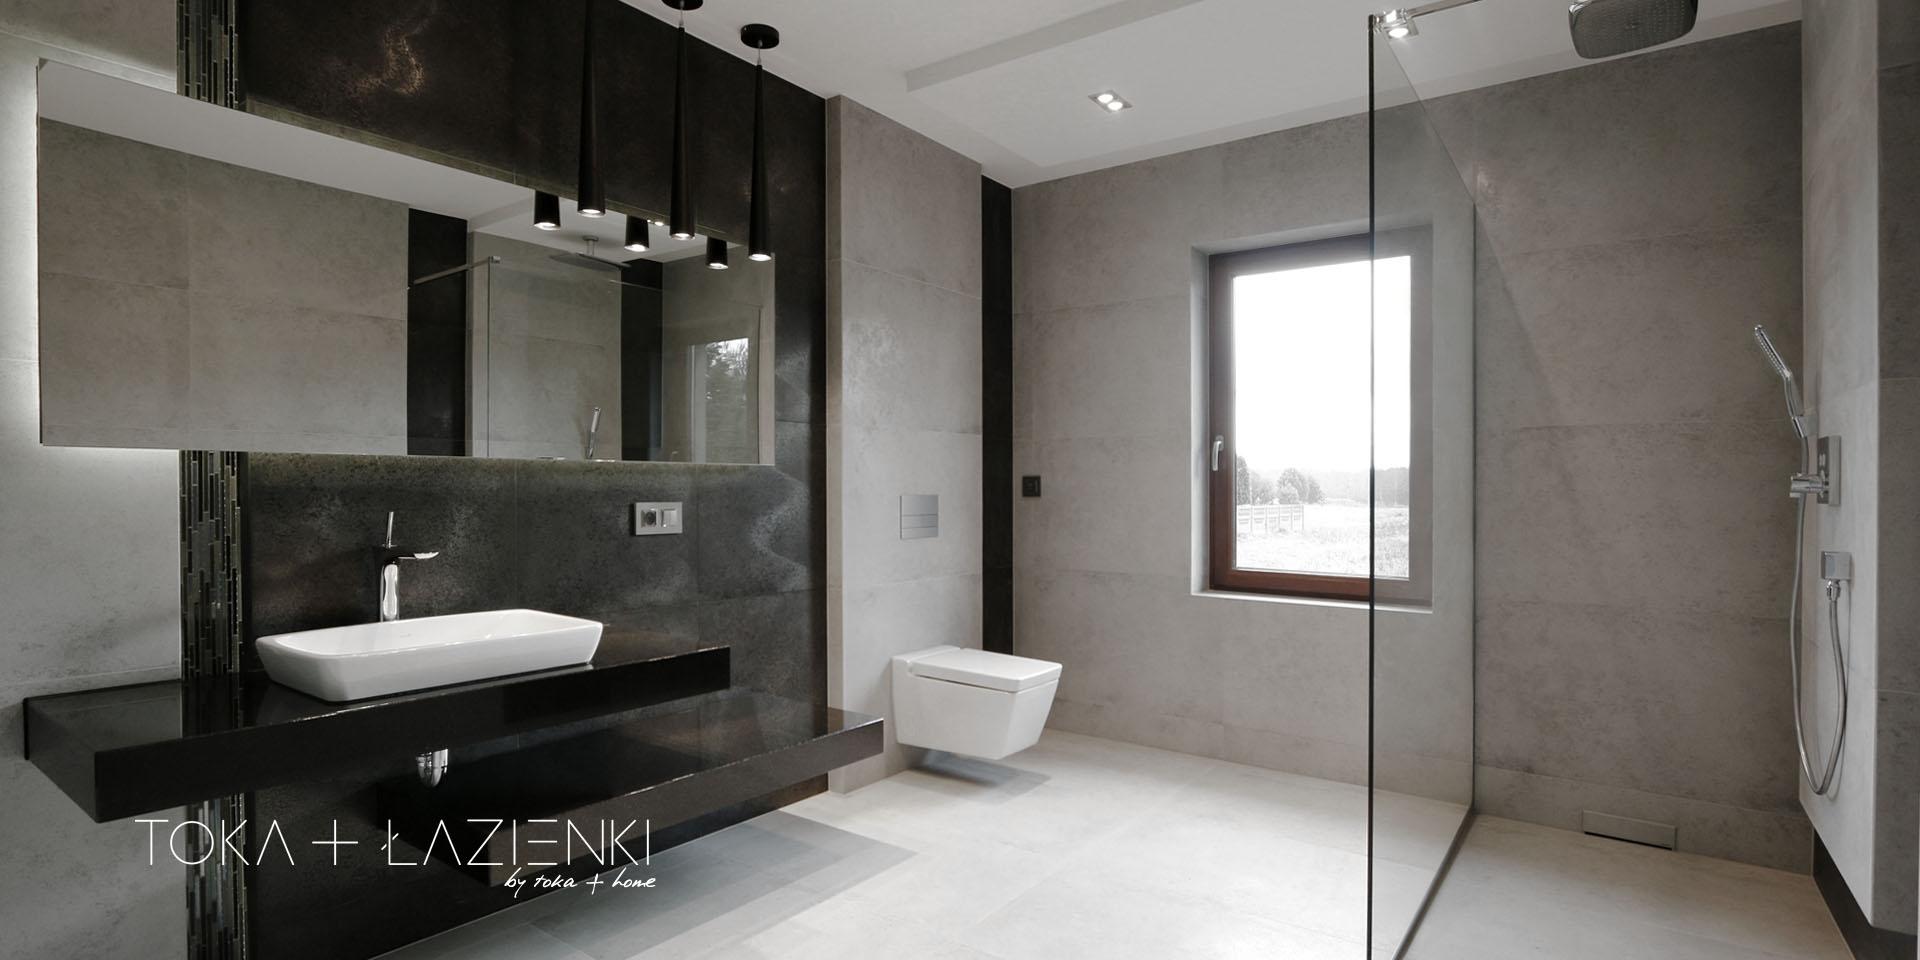 łazienki śląsk